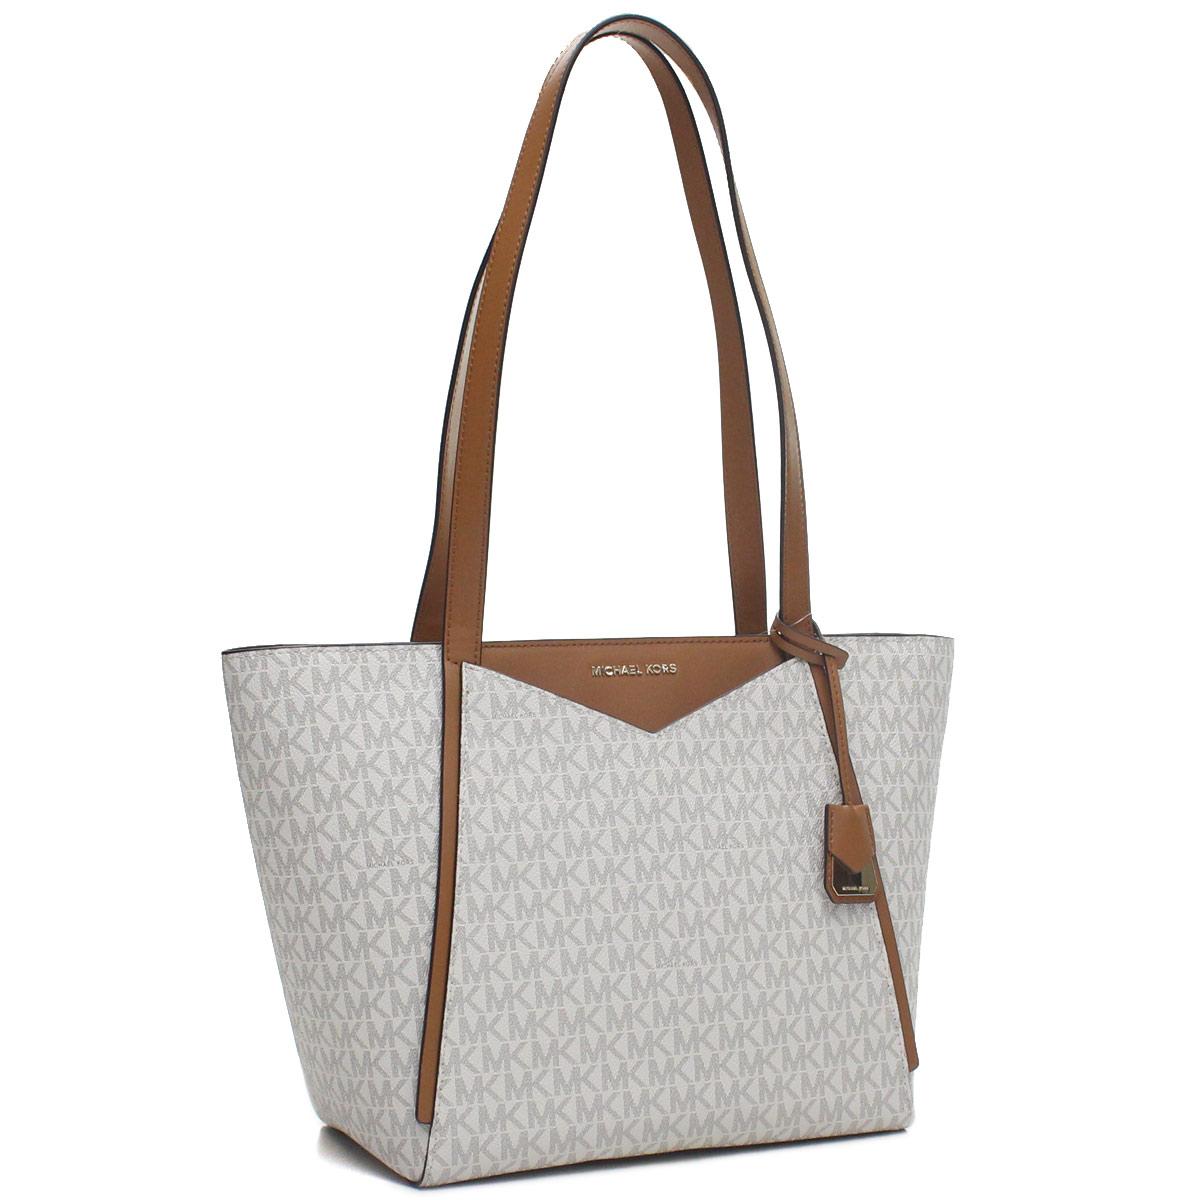 Hit The Total Brand Whole Michael Kors M Tote Groupe Bag 30s8gn1t1b Vanilla White System Brown Rakuten Global Market